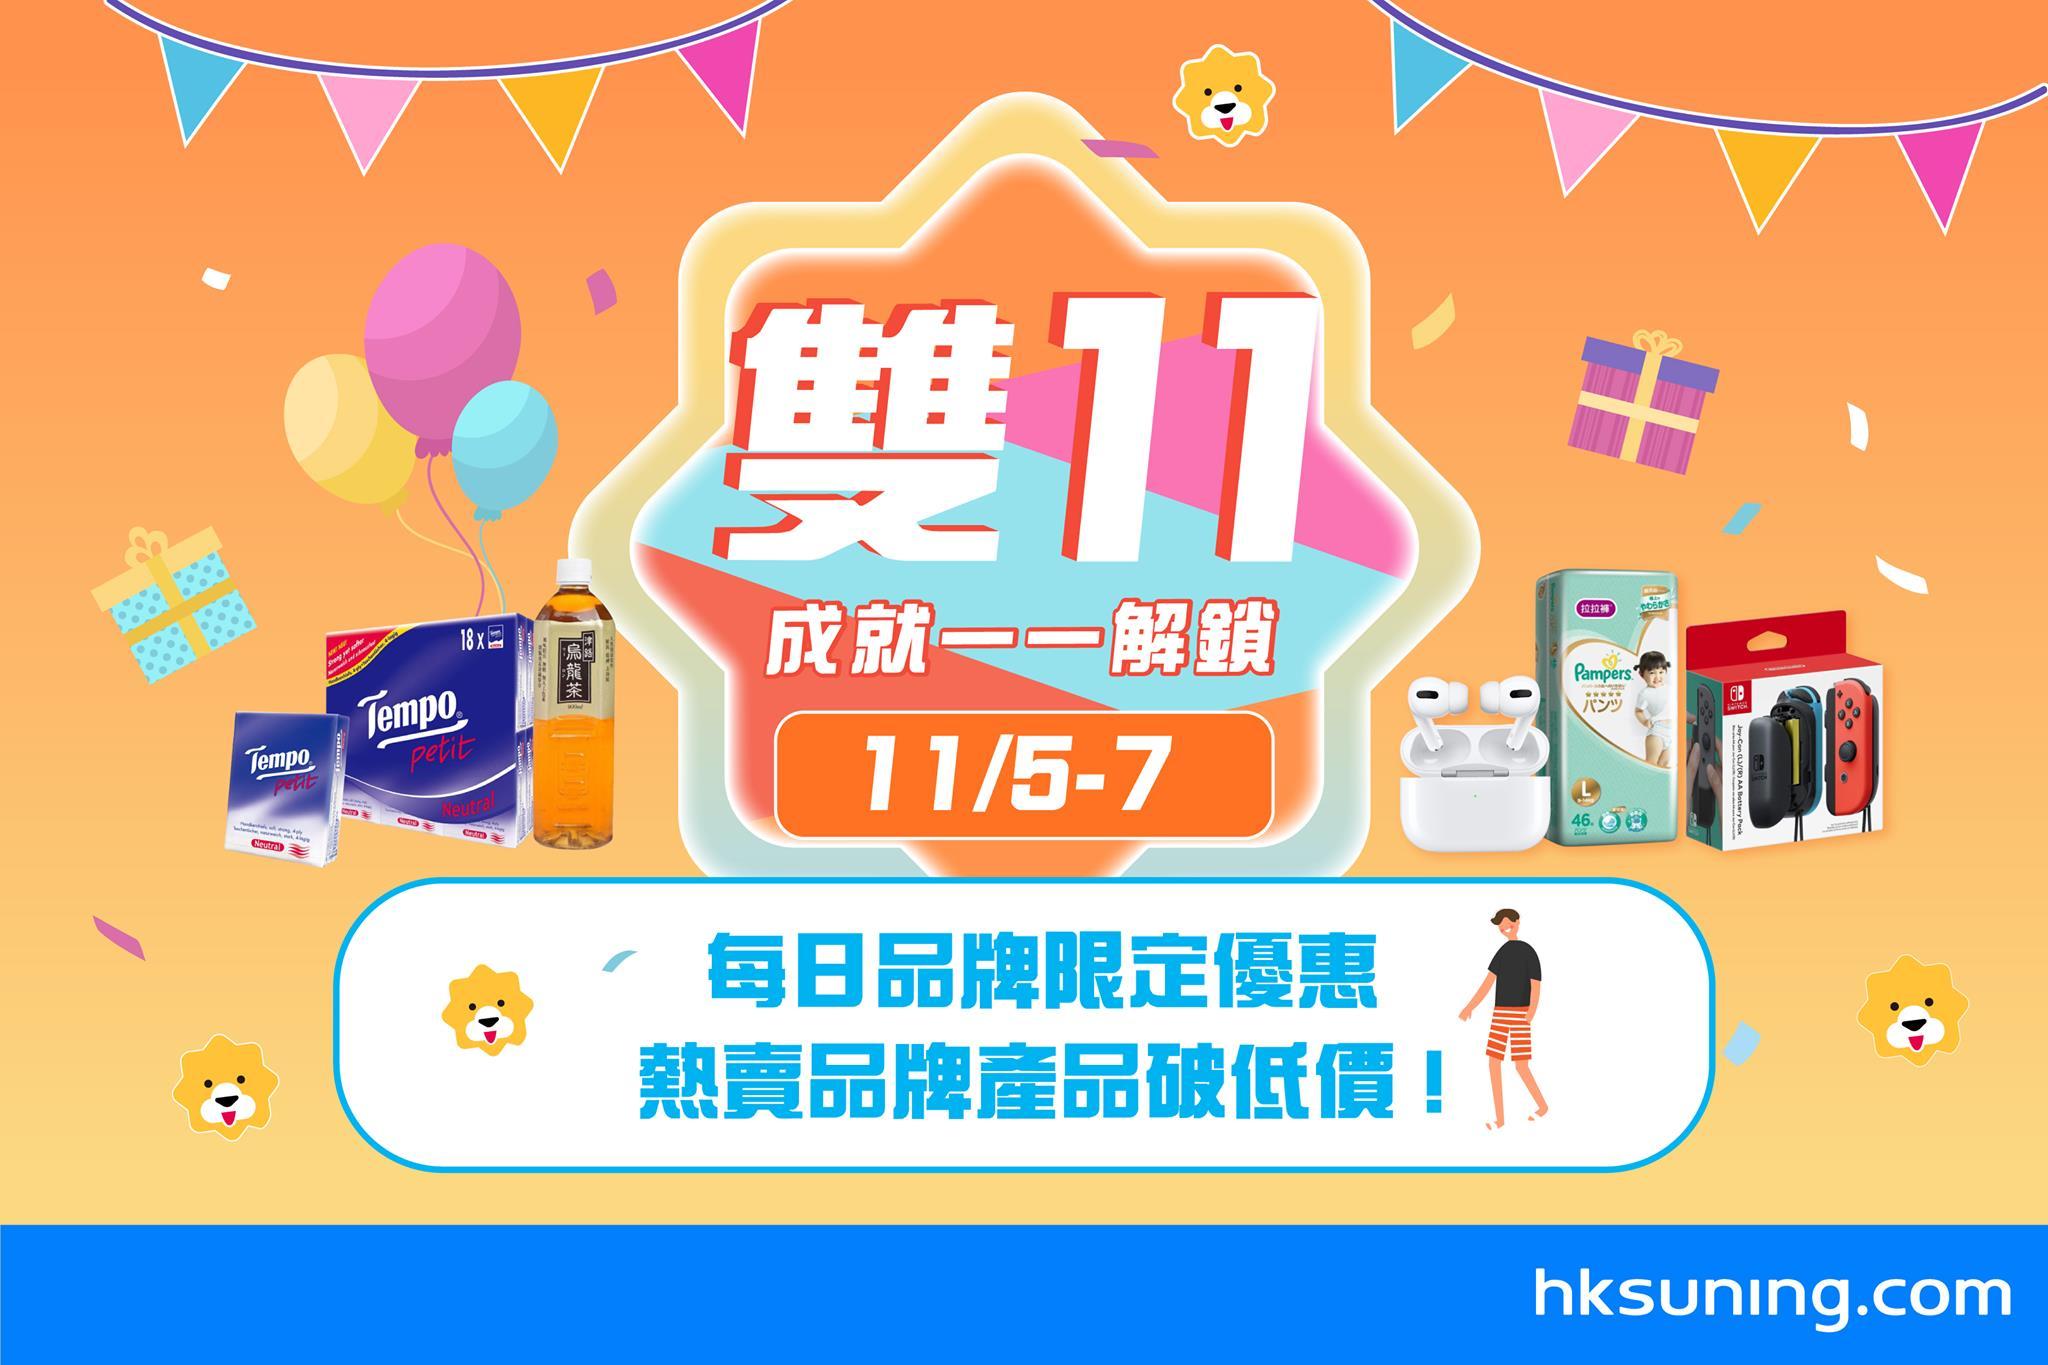 Suning HK 1111 sales